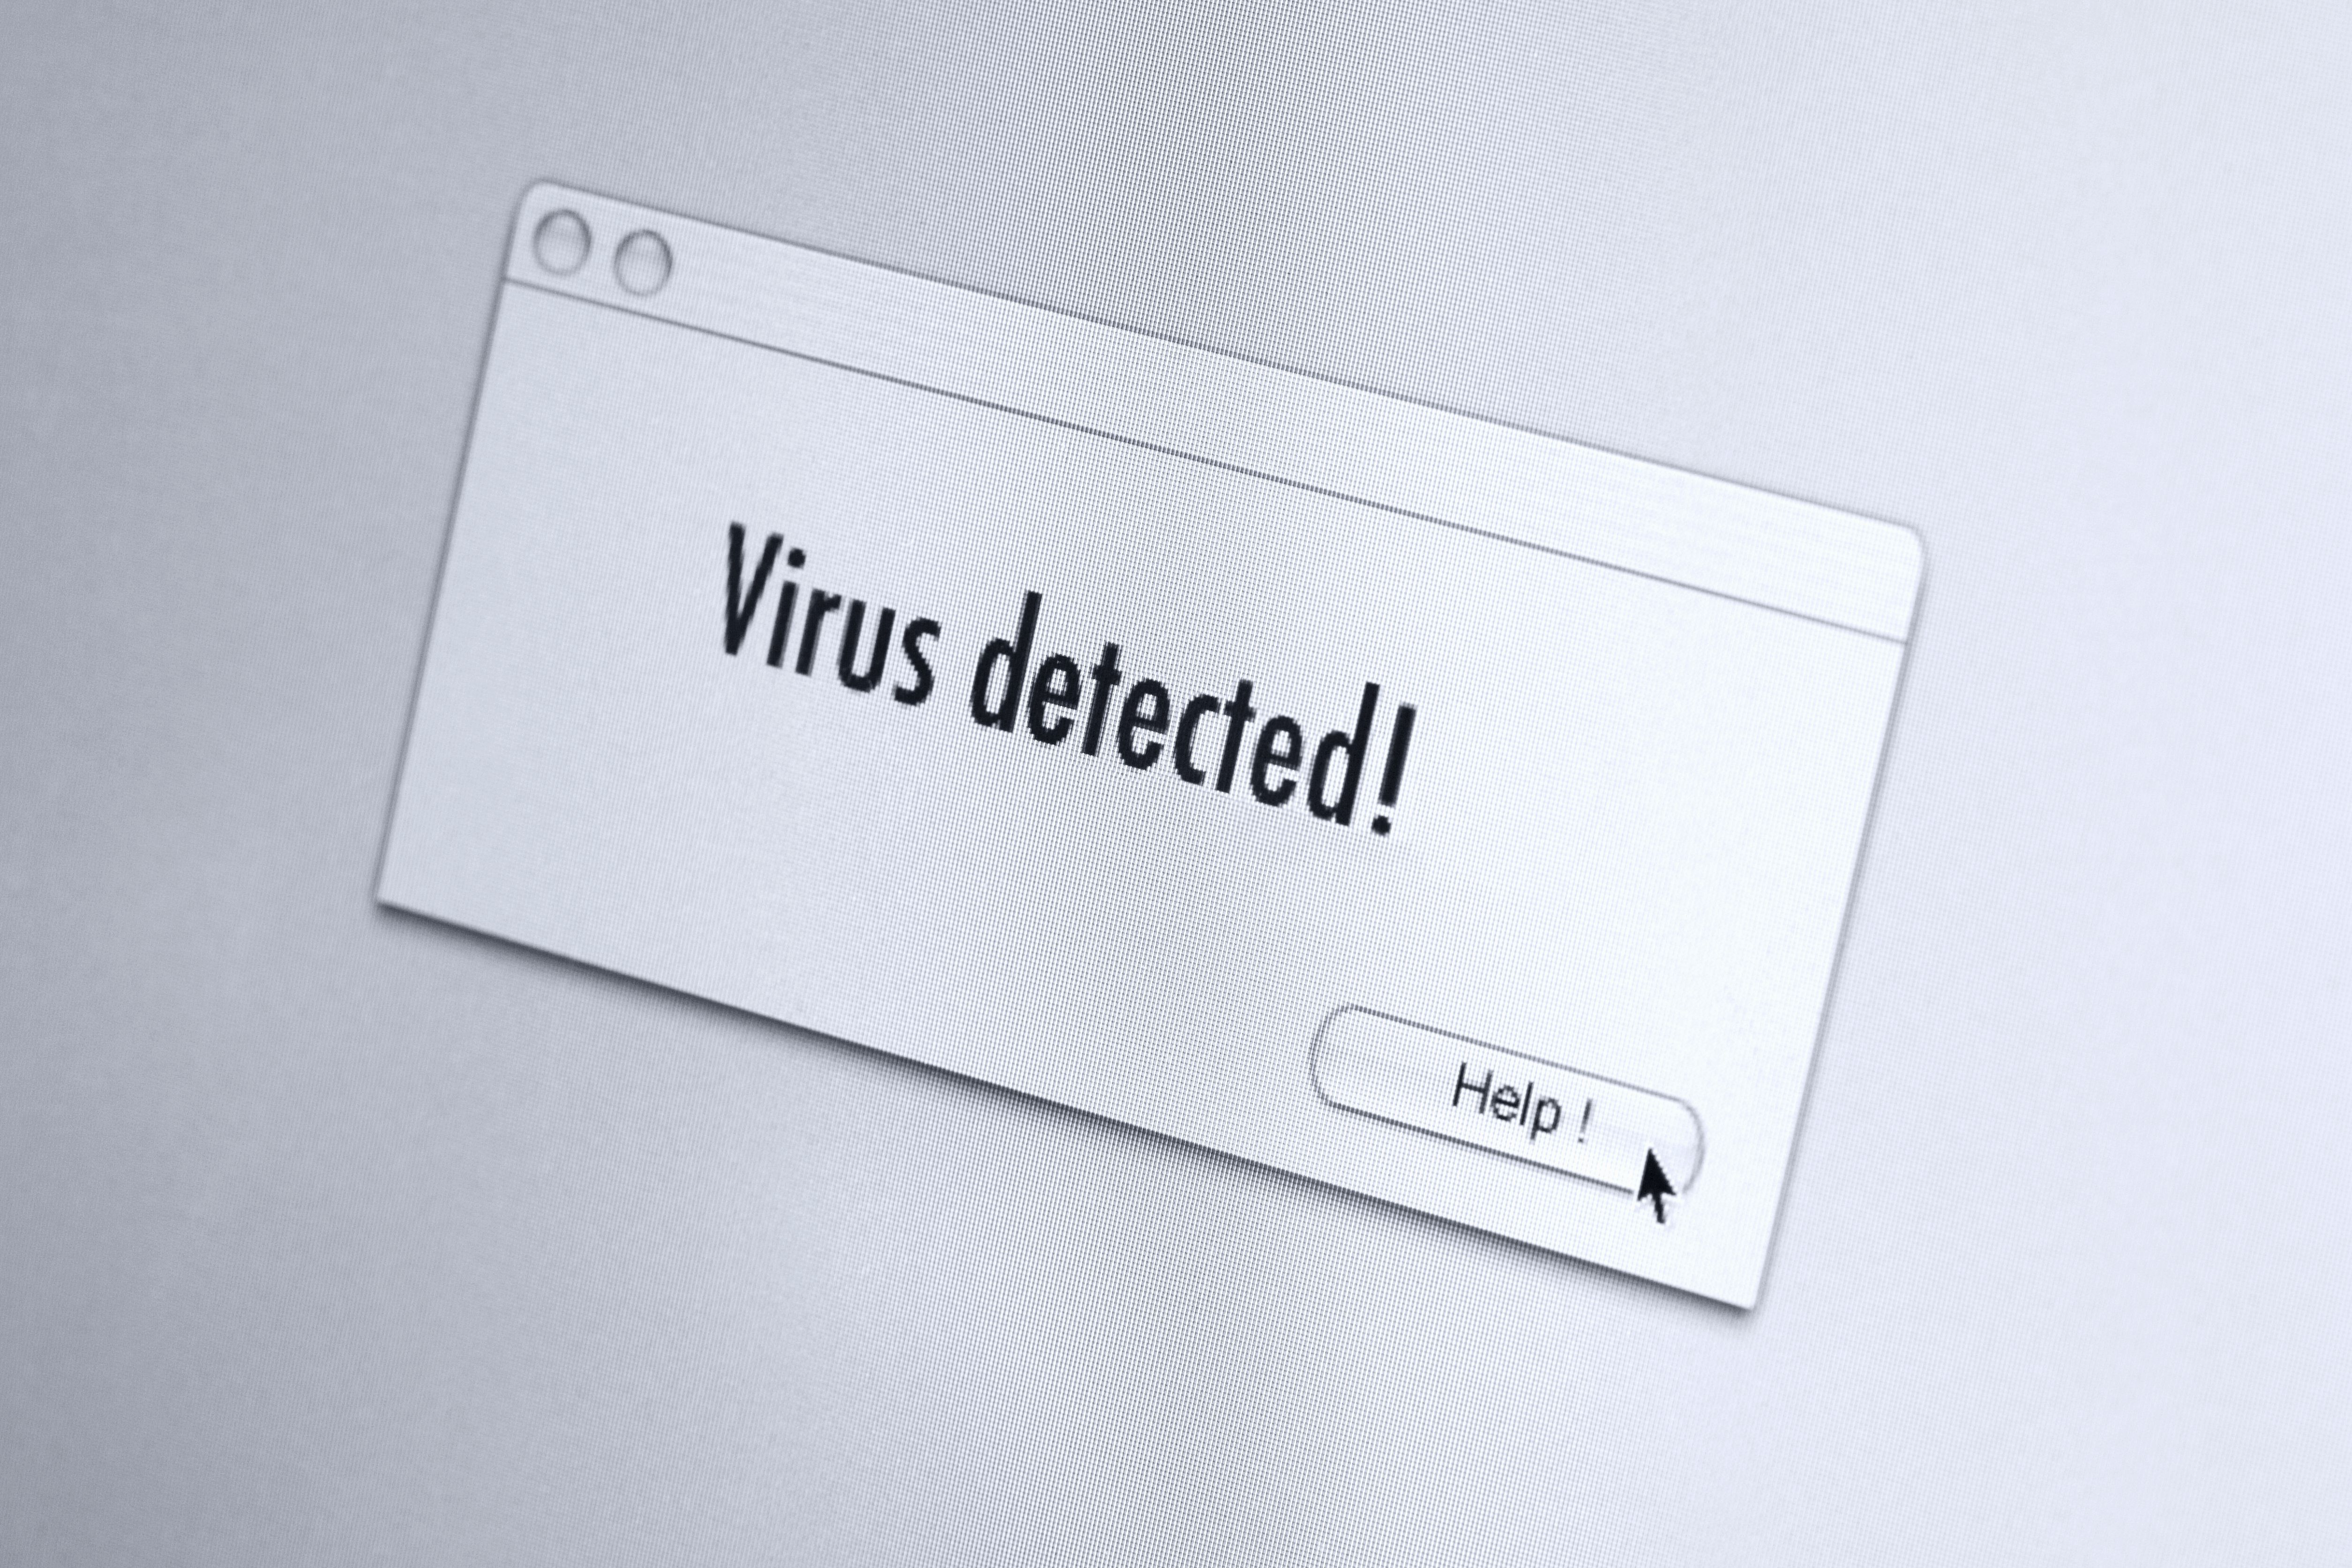 does safe mode disable antivirus